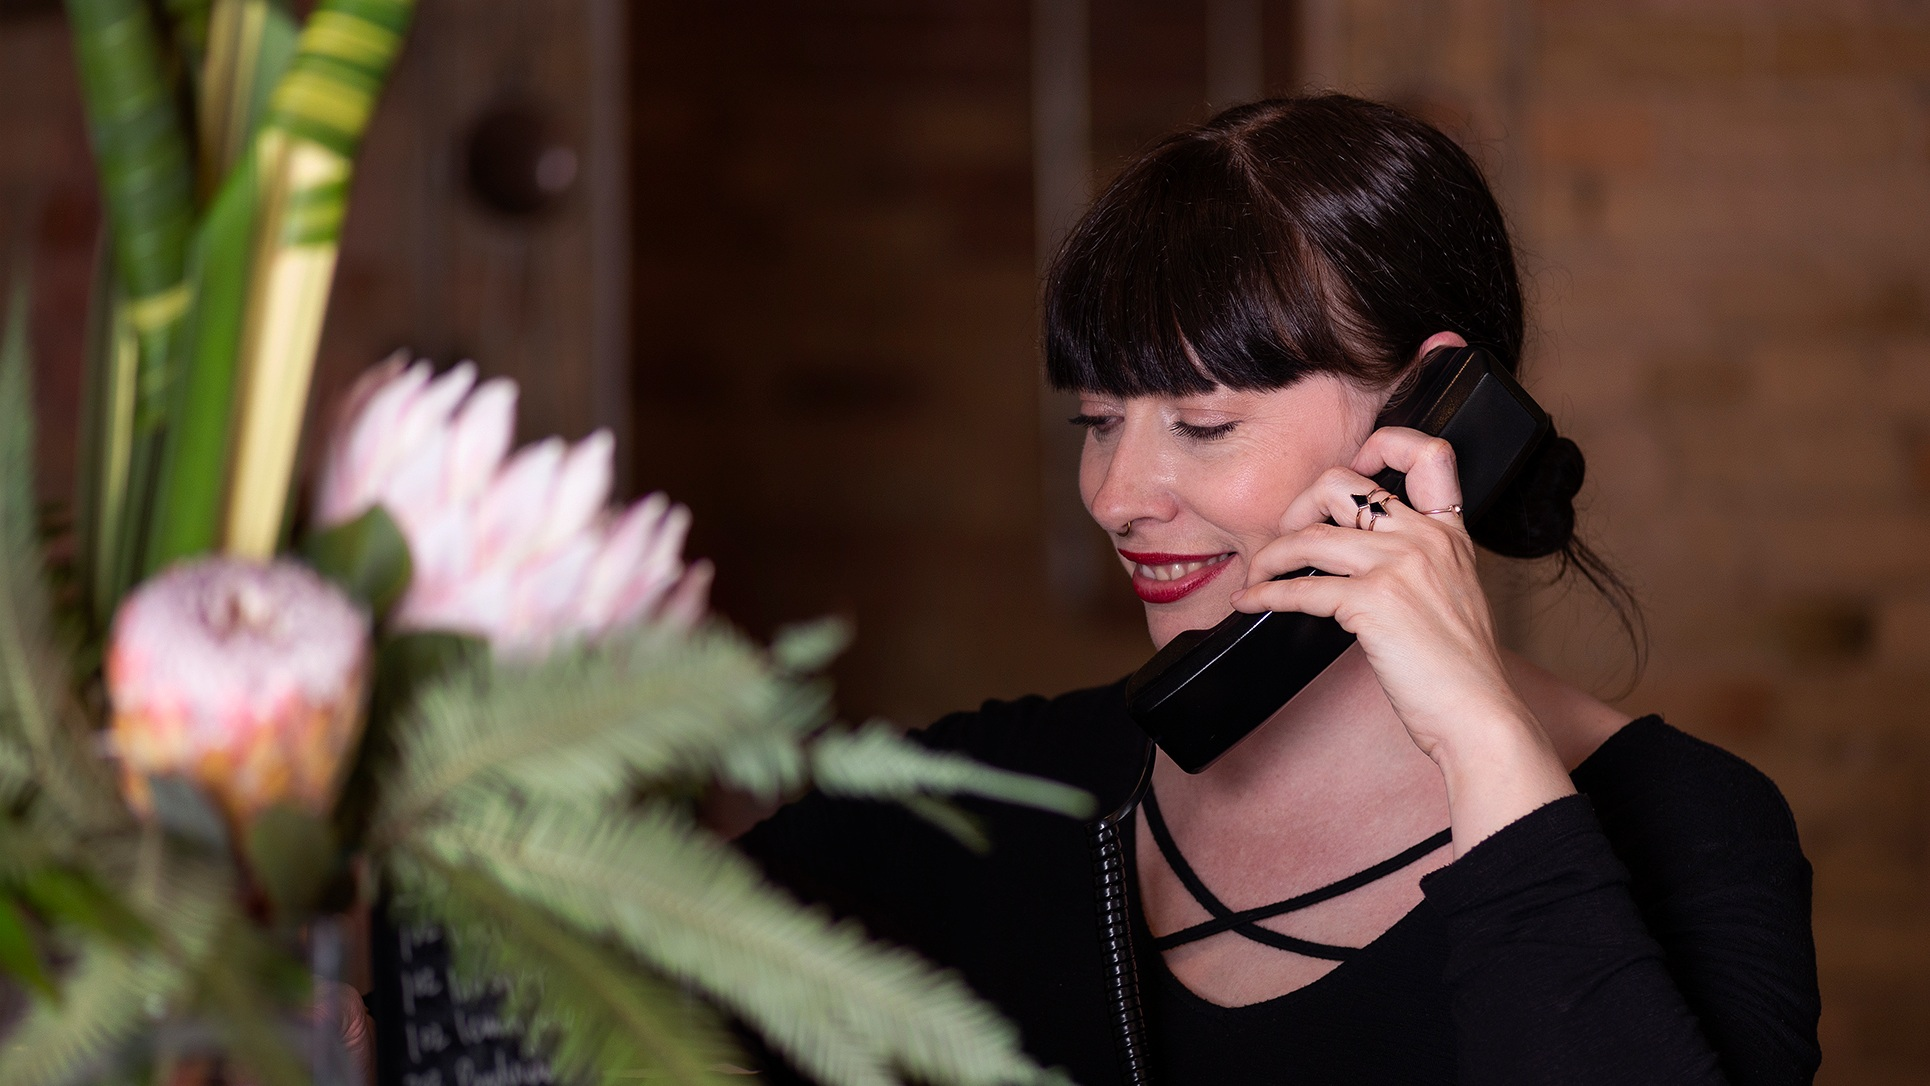 Lindsay+answering+phone